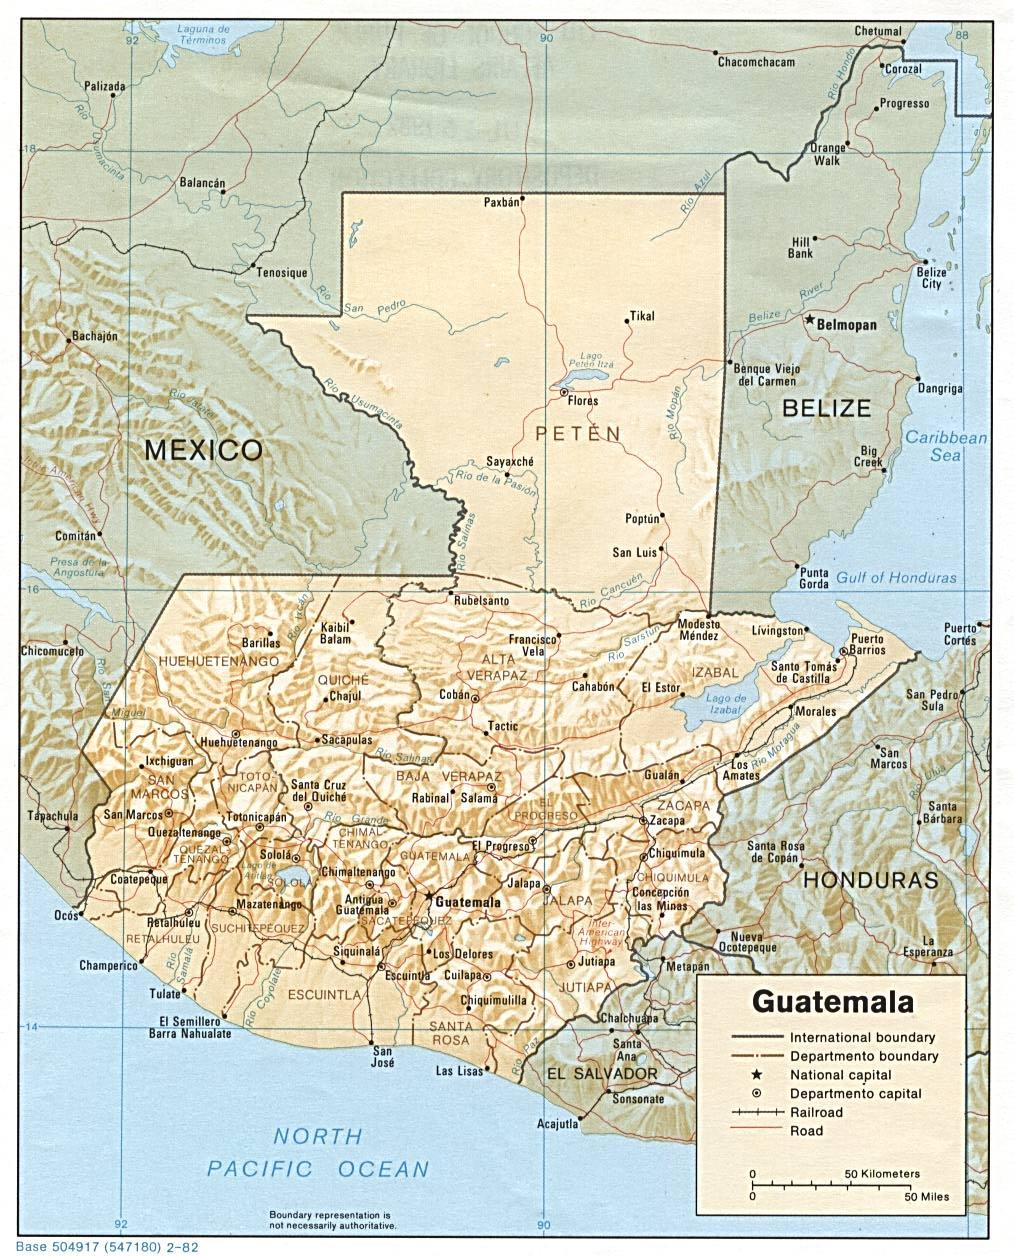 Map of Guatemala (Relief Map) : Weltkarte.com - Karten und ...